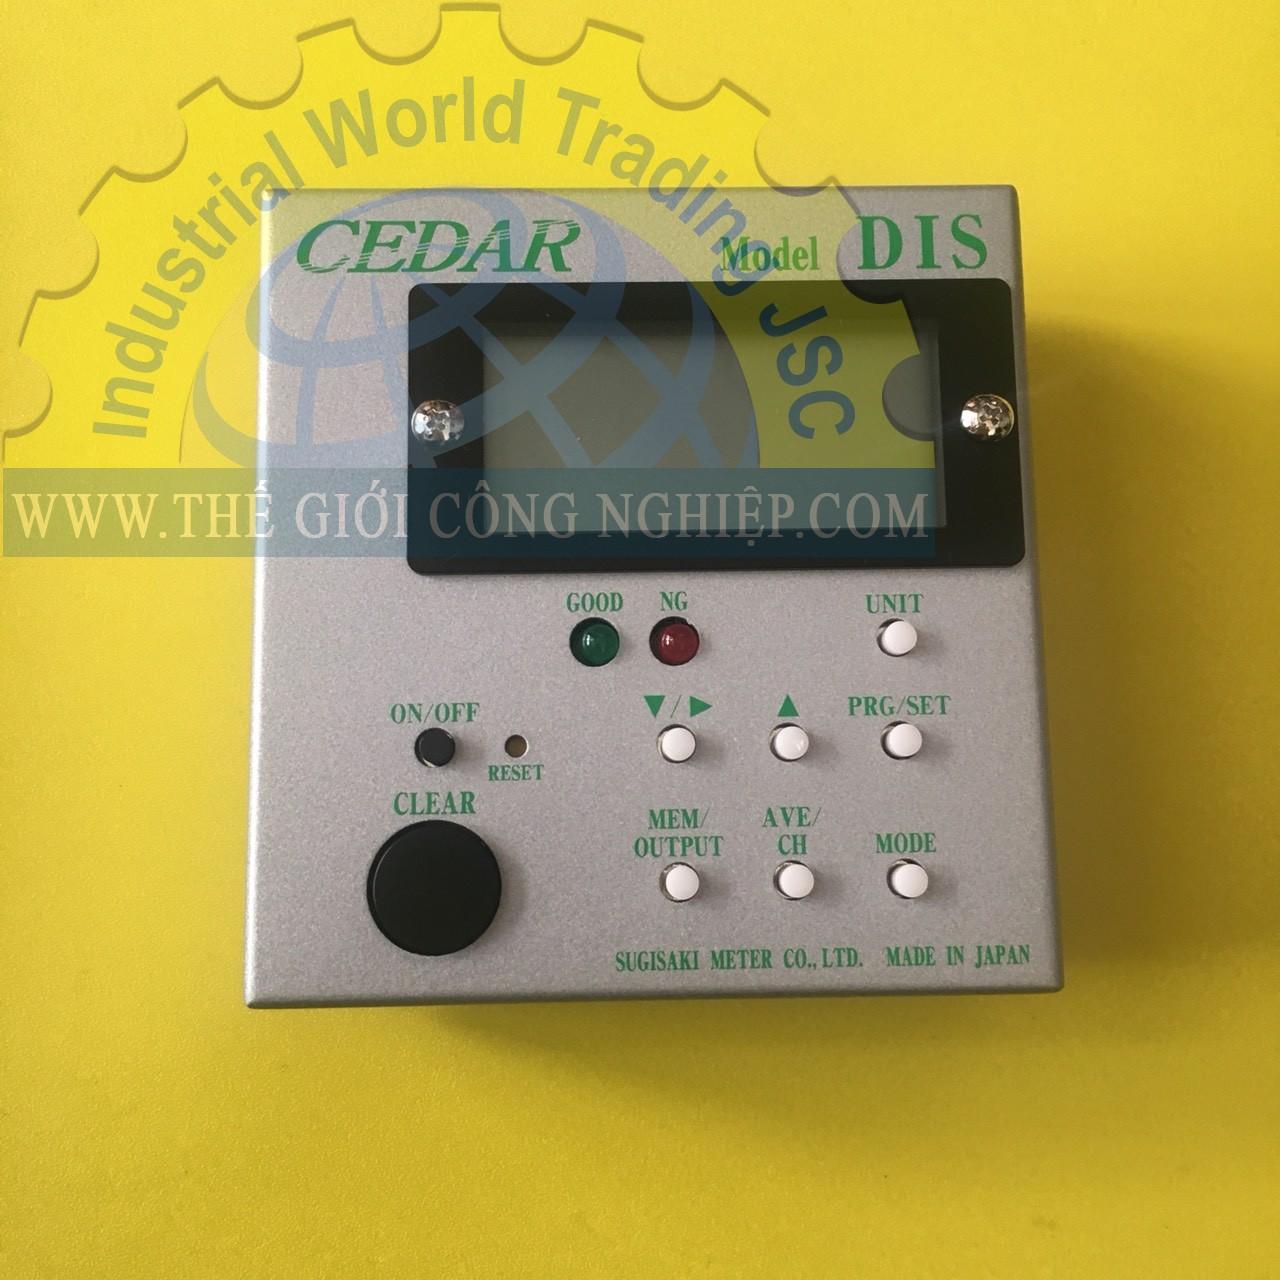 Torque Tester 0.20 - 20 N.m DIS-IPS20C Cedar